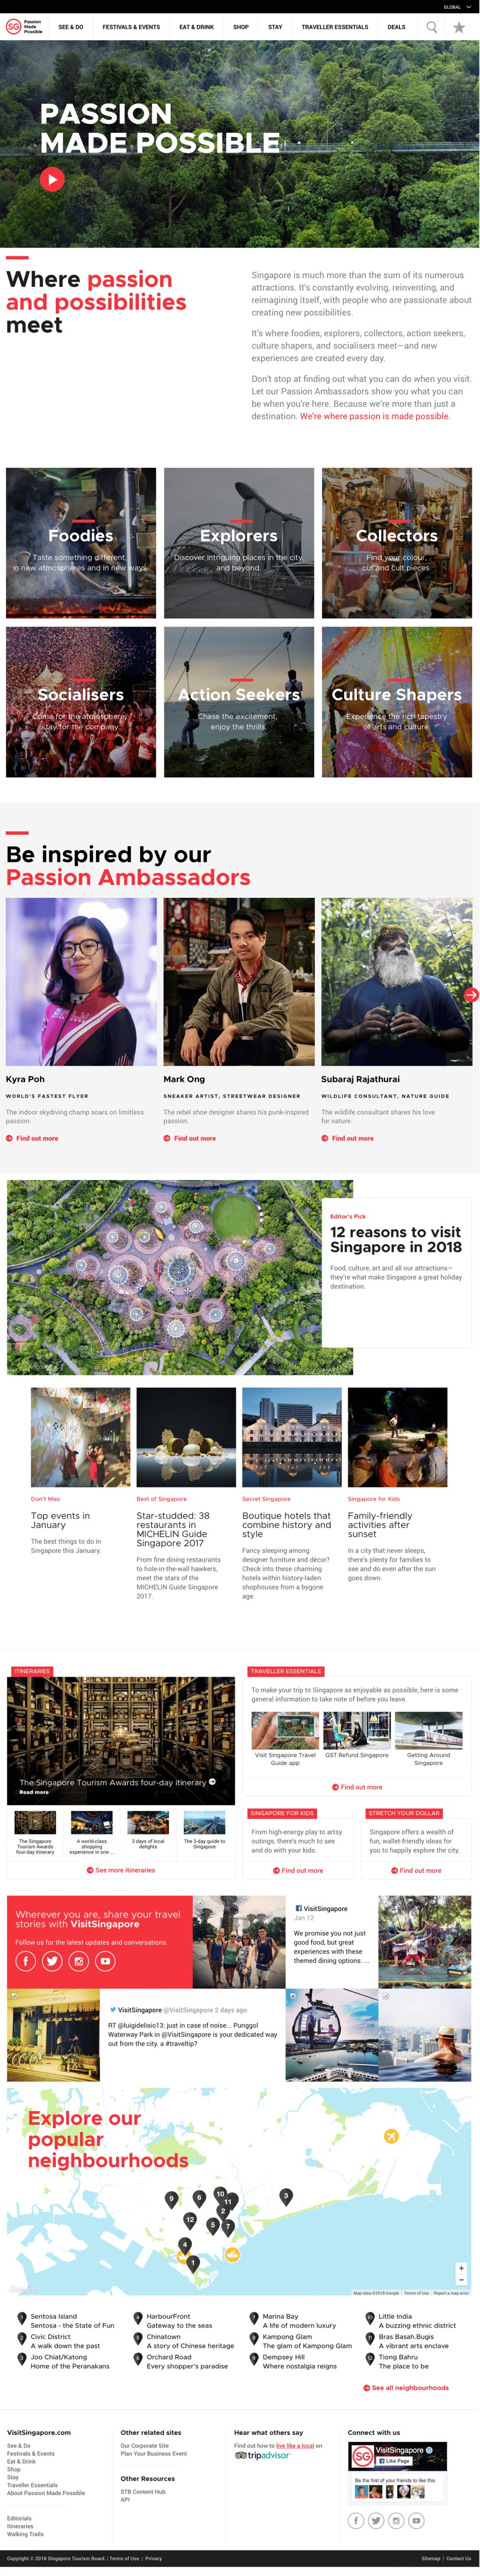 Visit Singapore Elegant Homepage